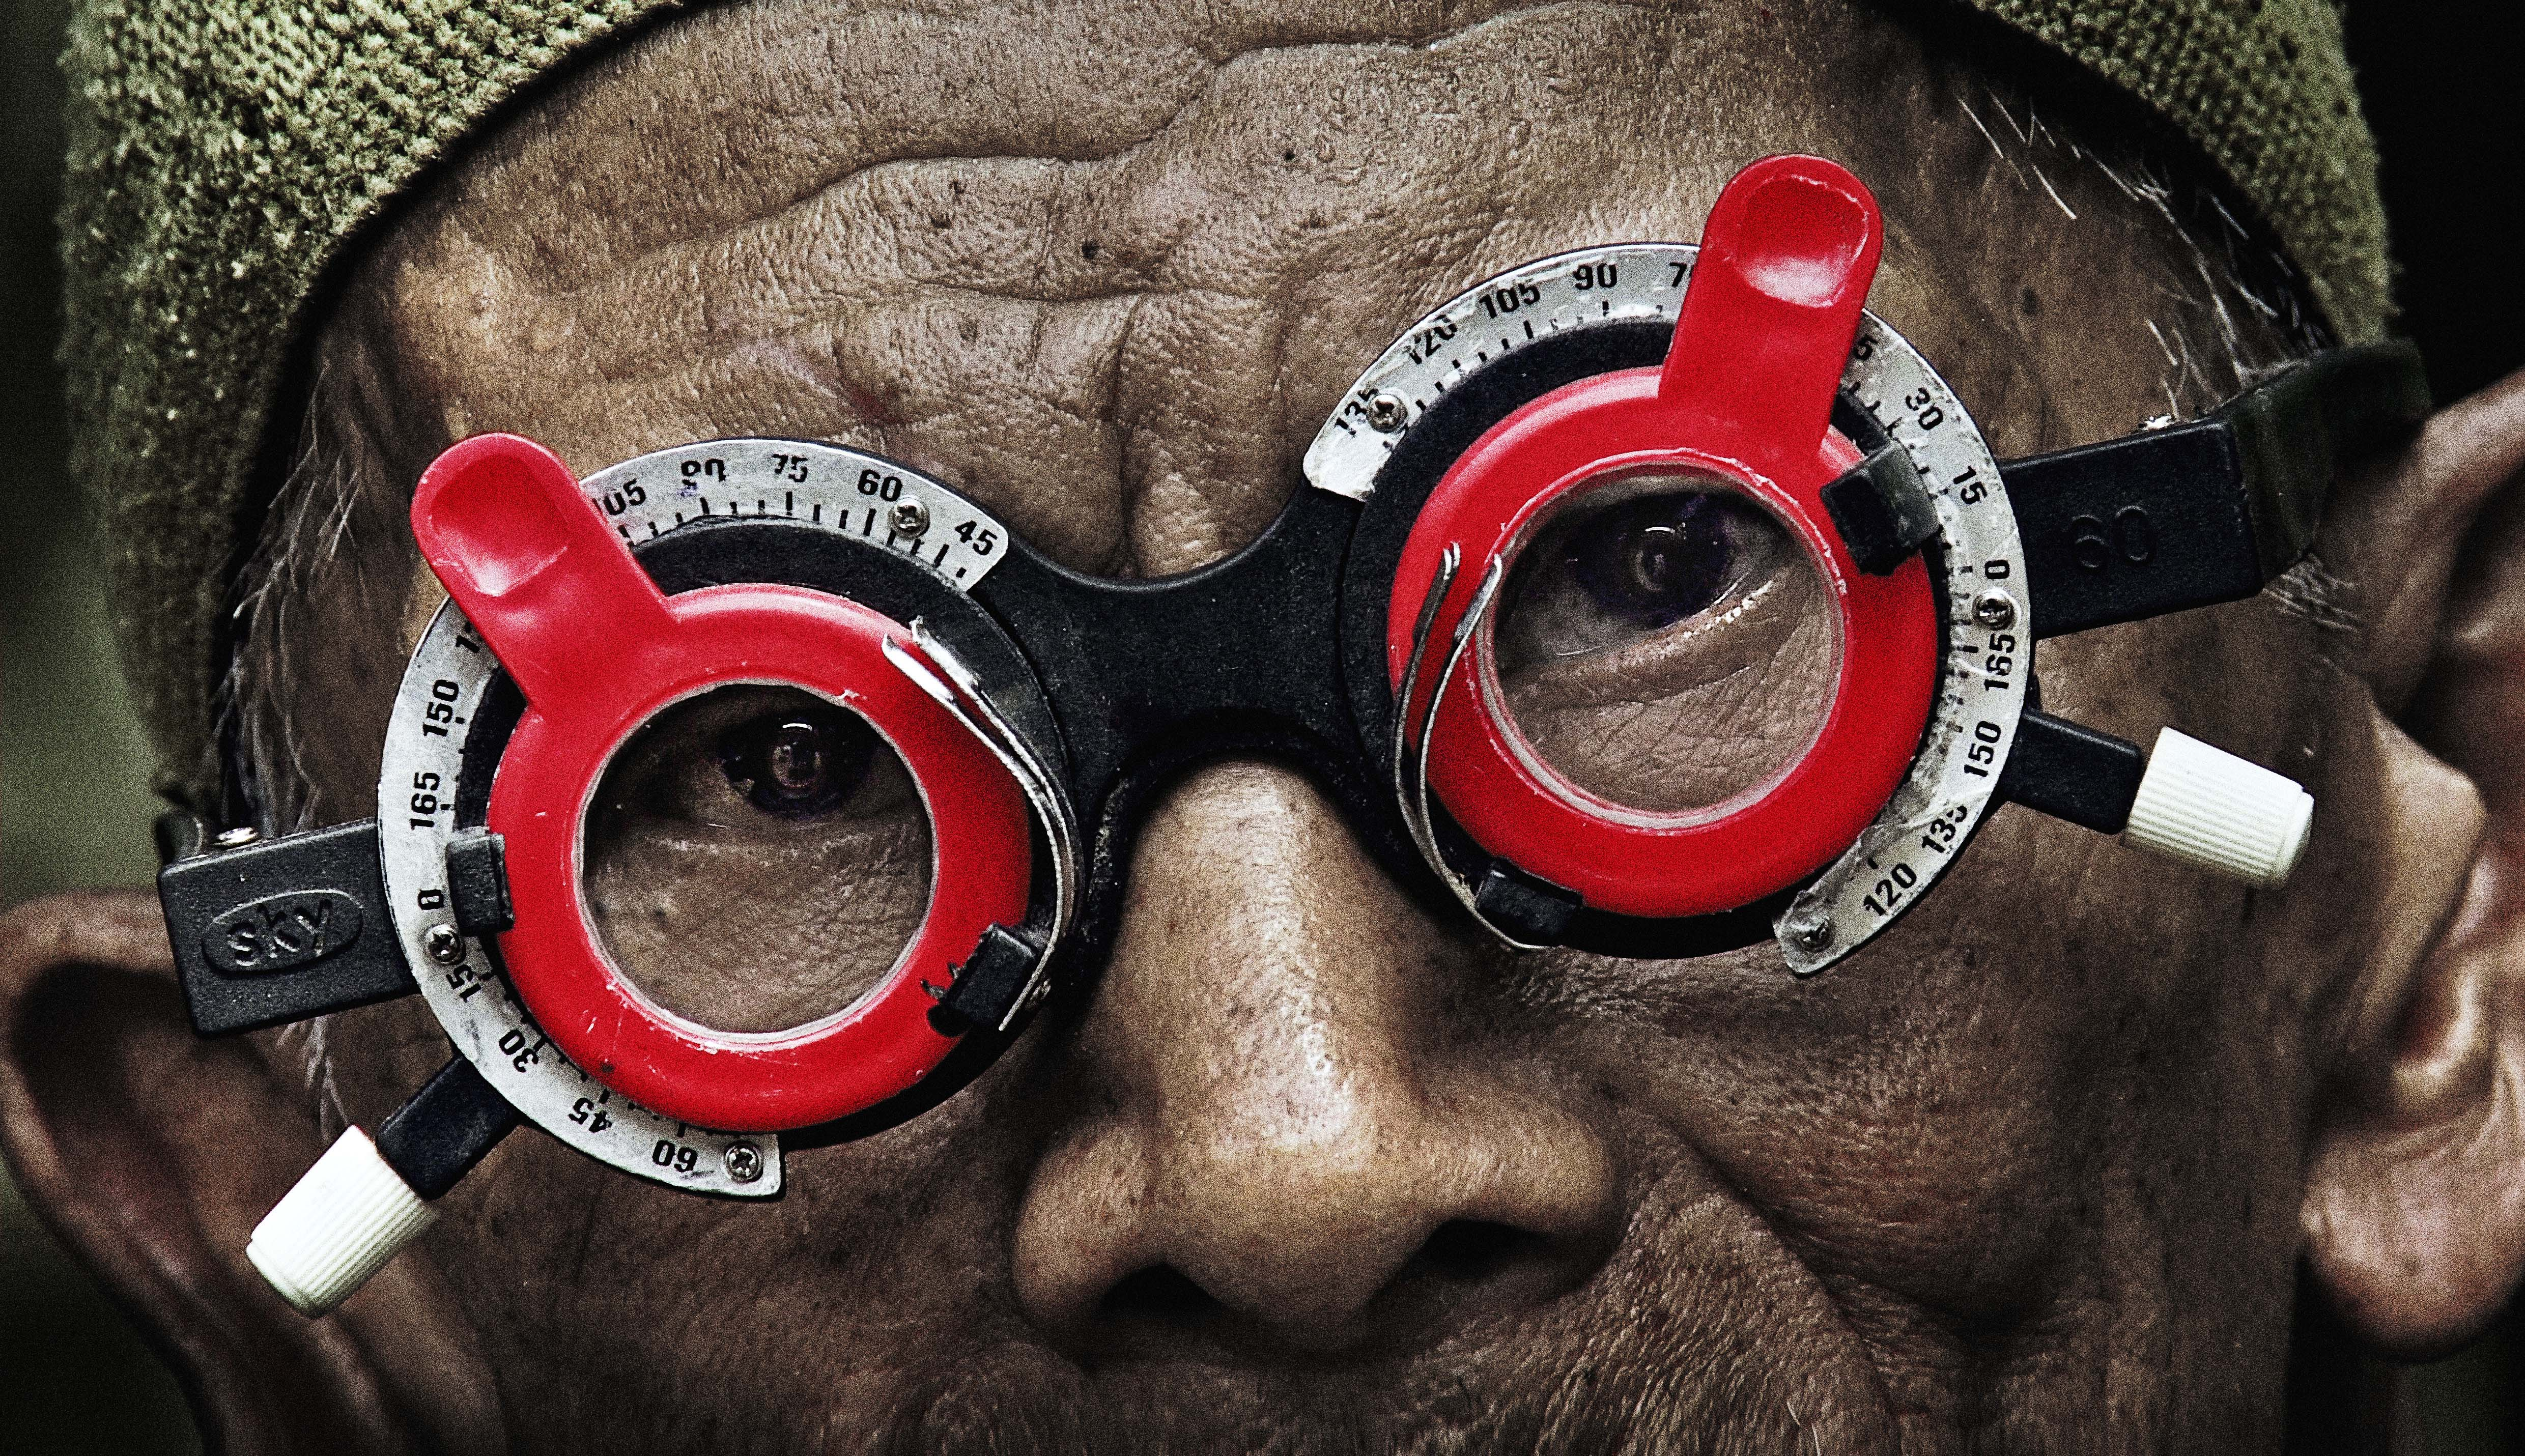 'La mirada del silencio' de Joshua Oppenheimer